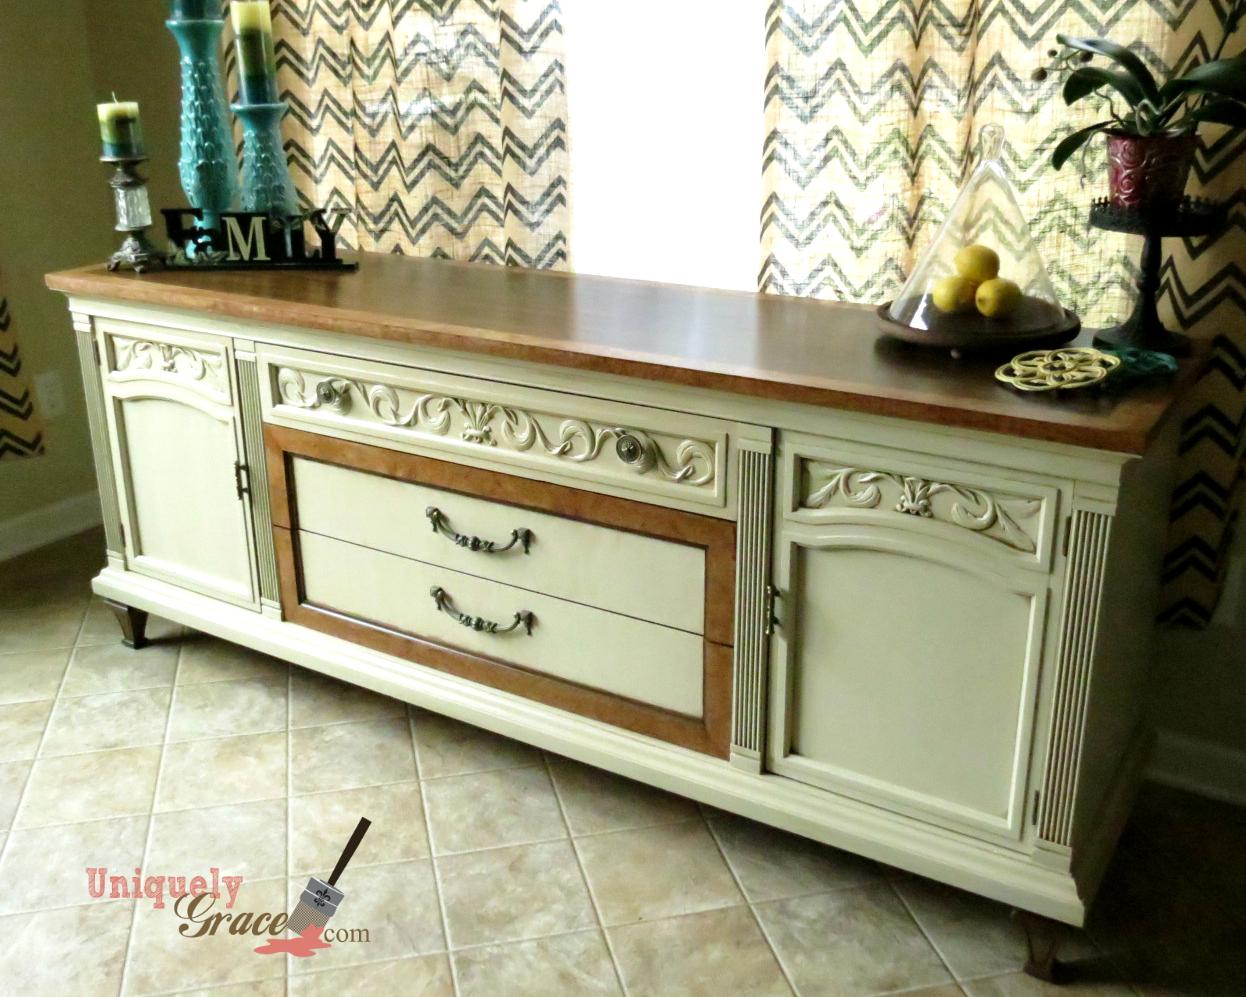 Drexel Buffet 80 inch front drawer full length vanilla bear hazelnut Revax black burled wood uniquely grace shabby paints